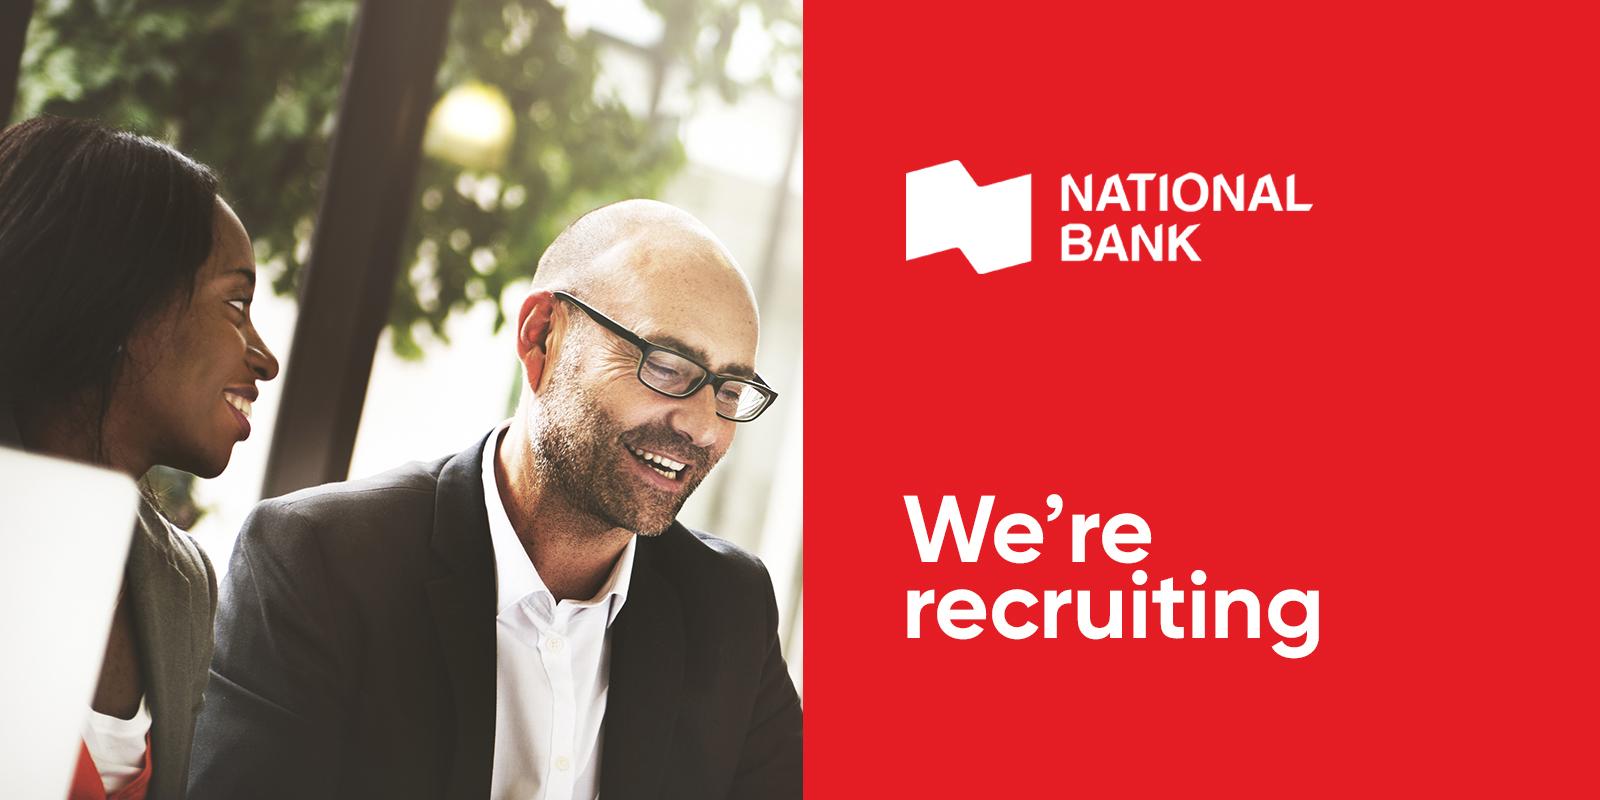 national bank merchant services